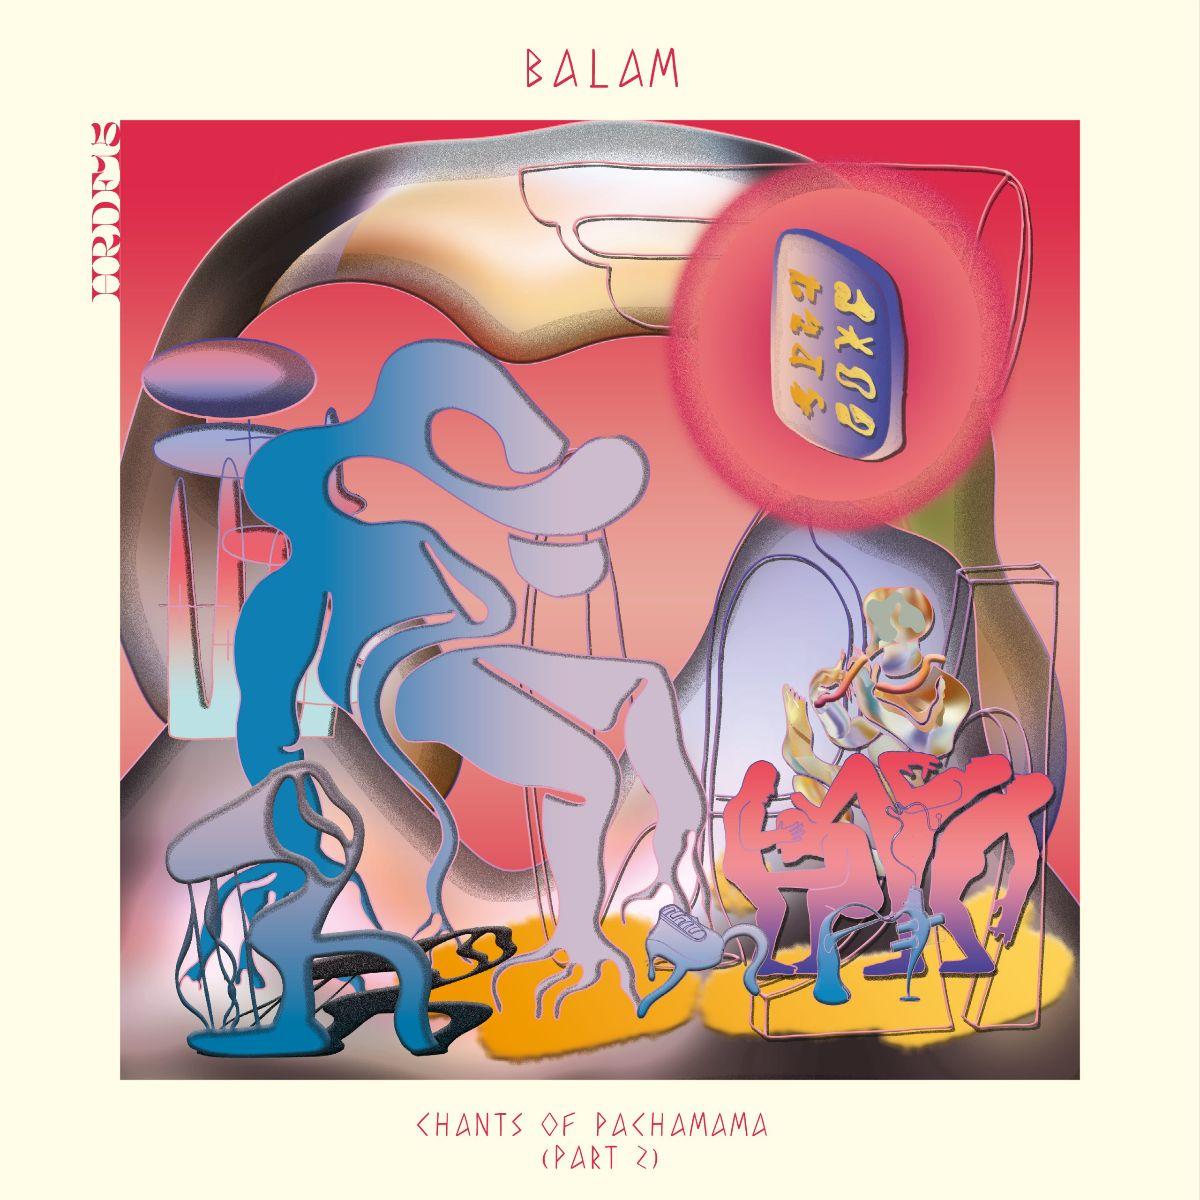 Balam - Chants of Pachamama Part 2